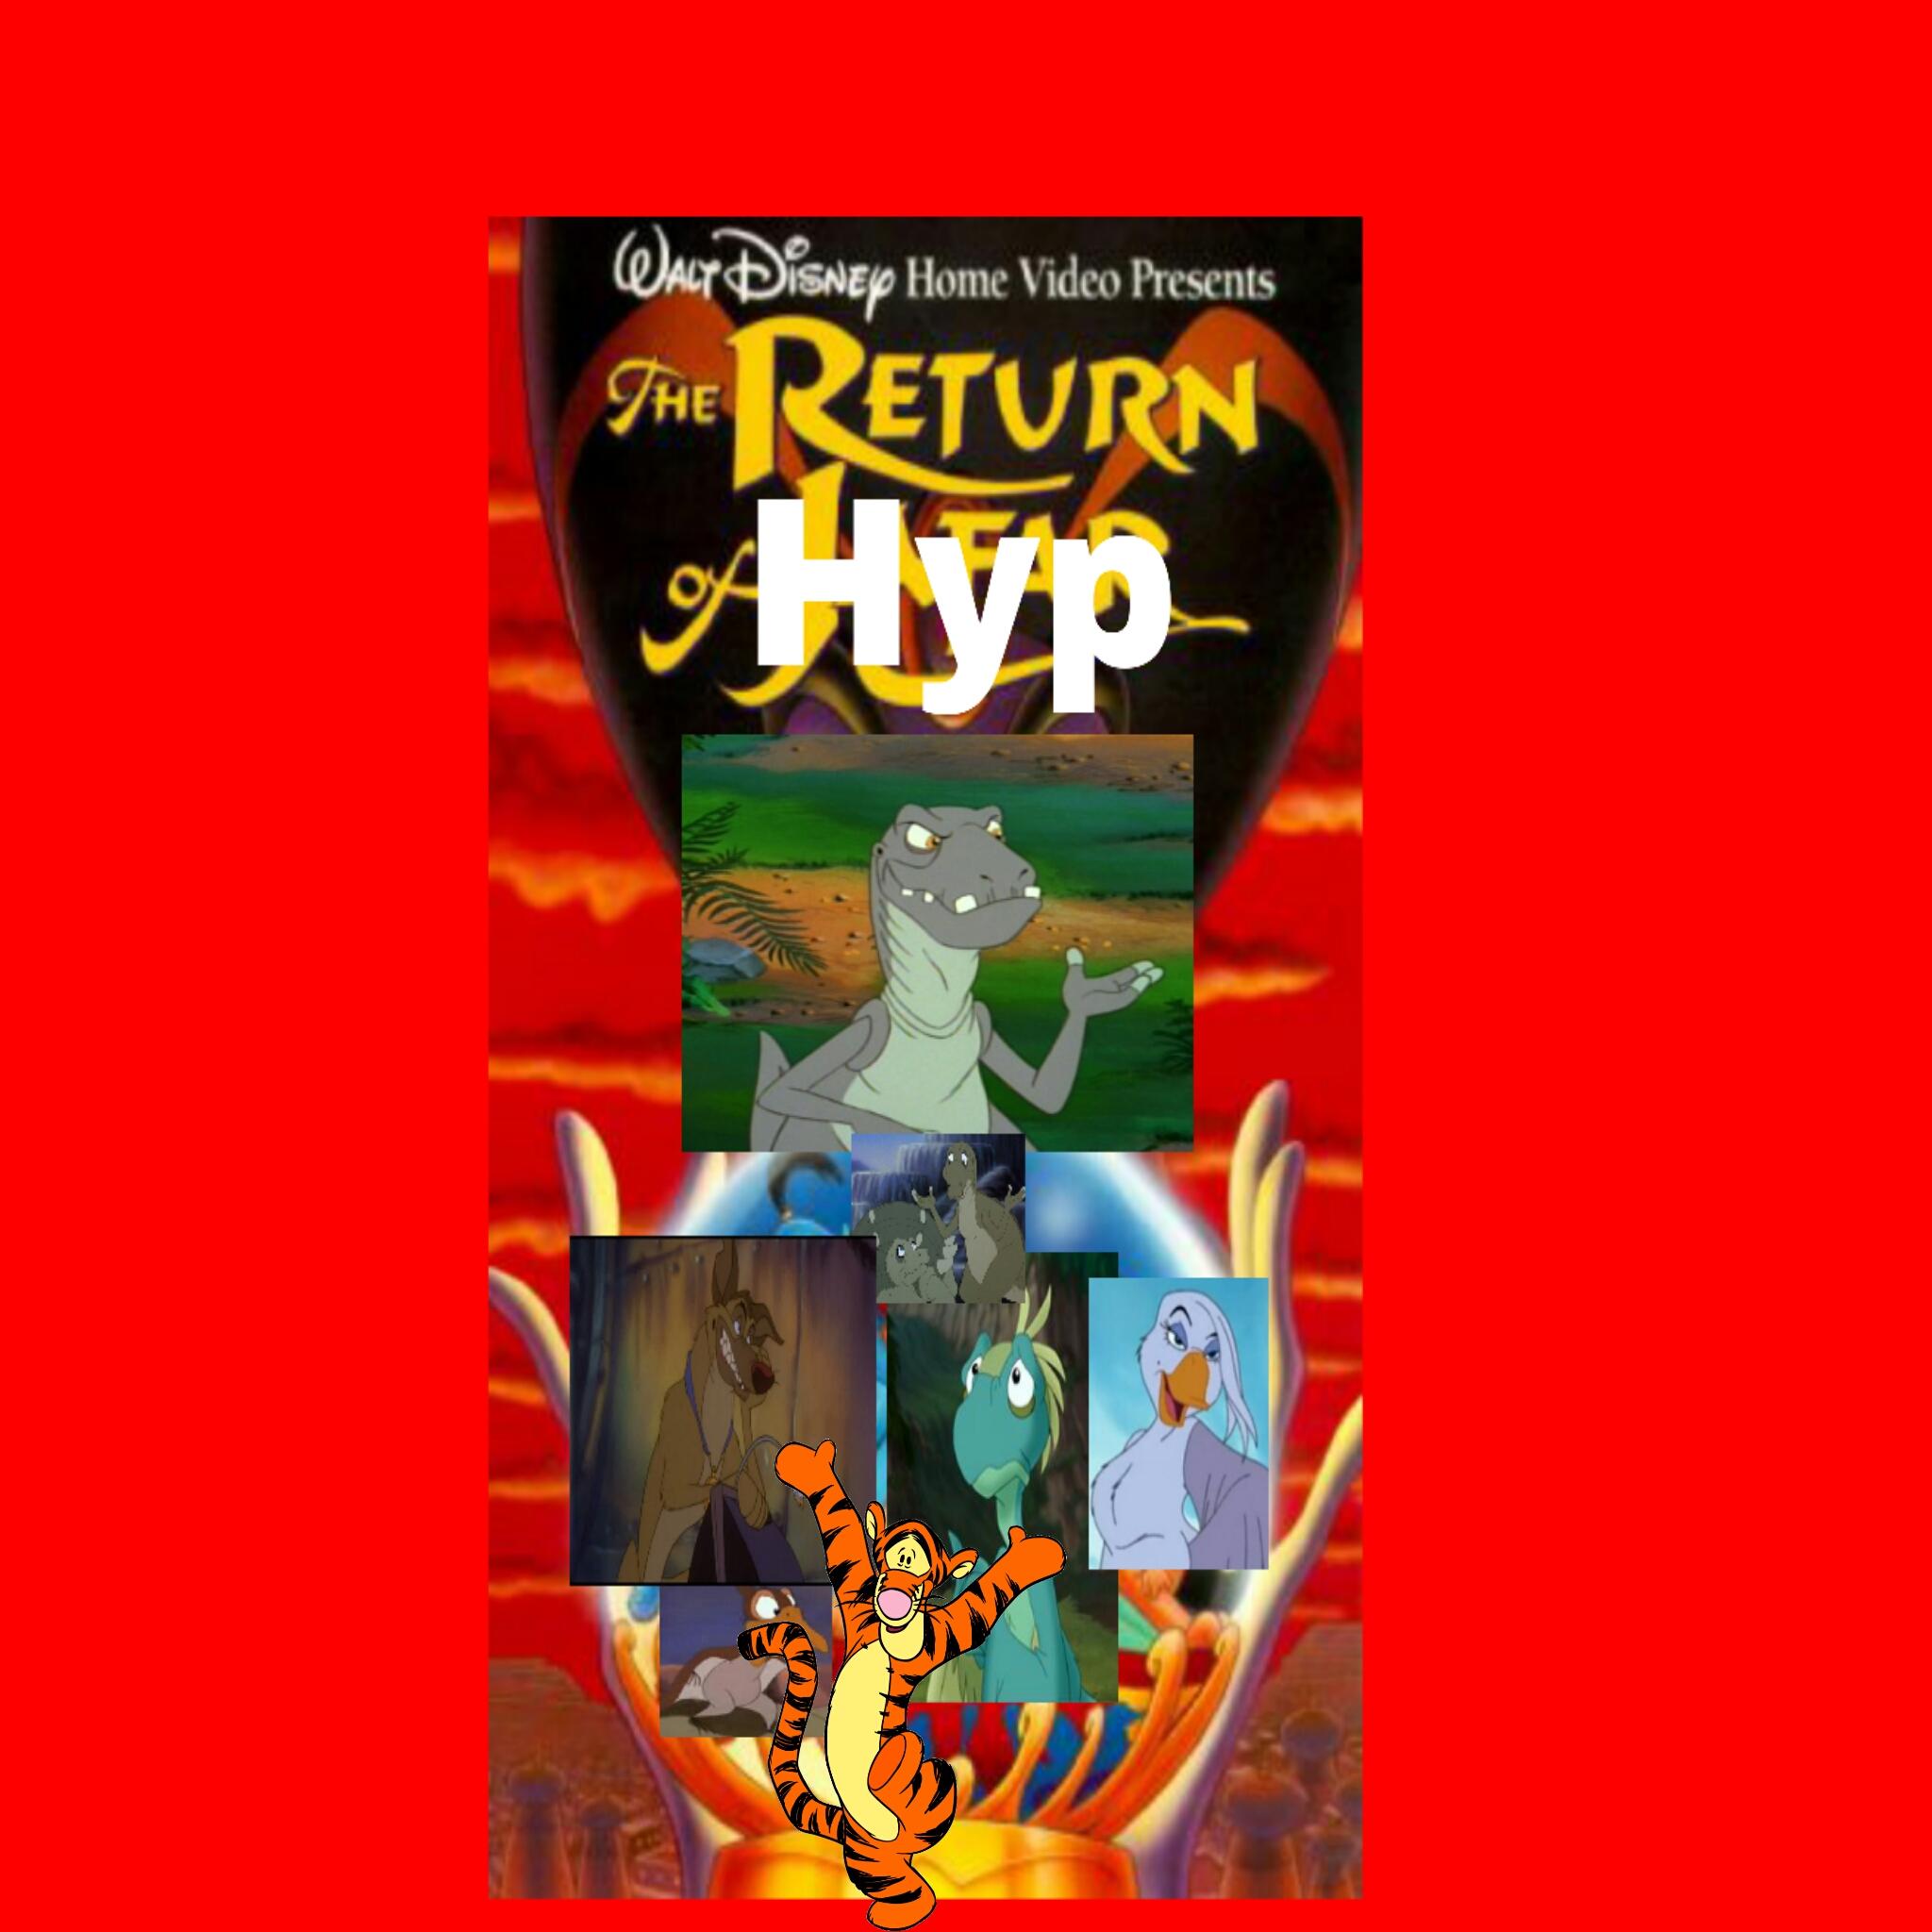 Guidoladdin 2: The Return of Hyp